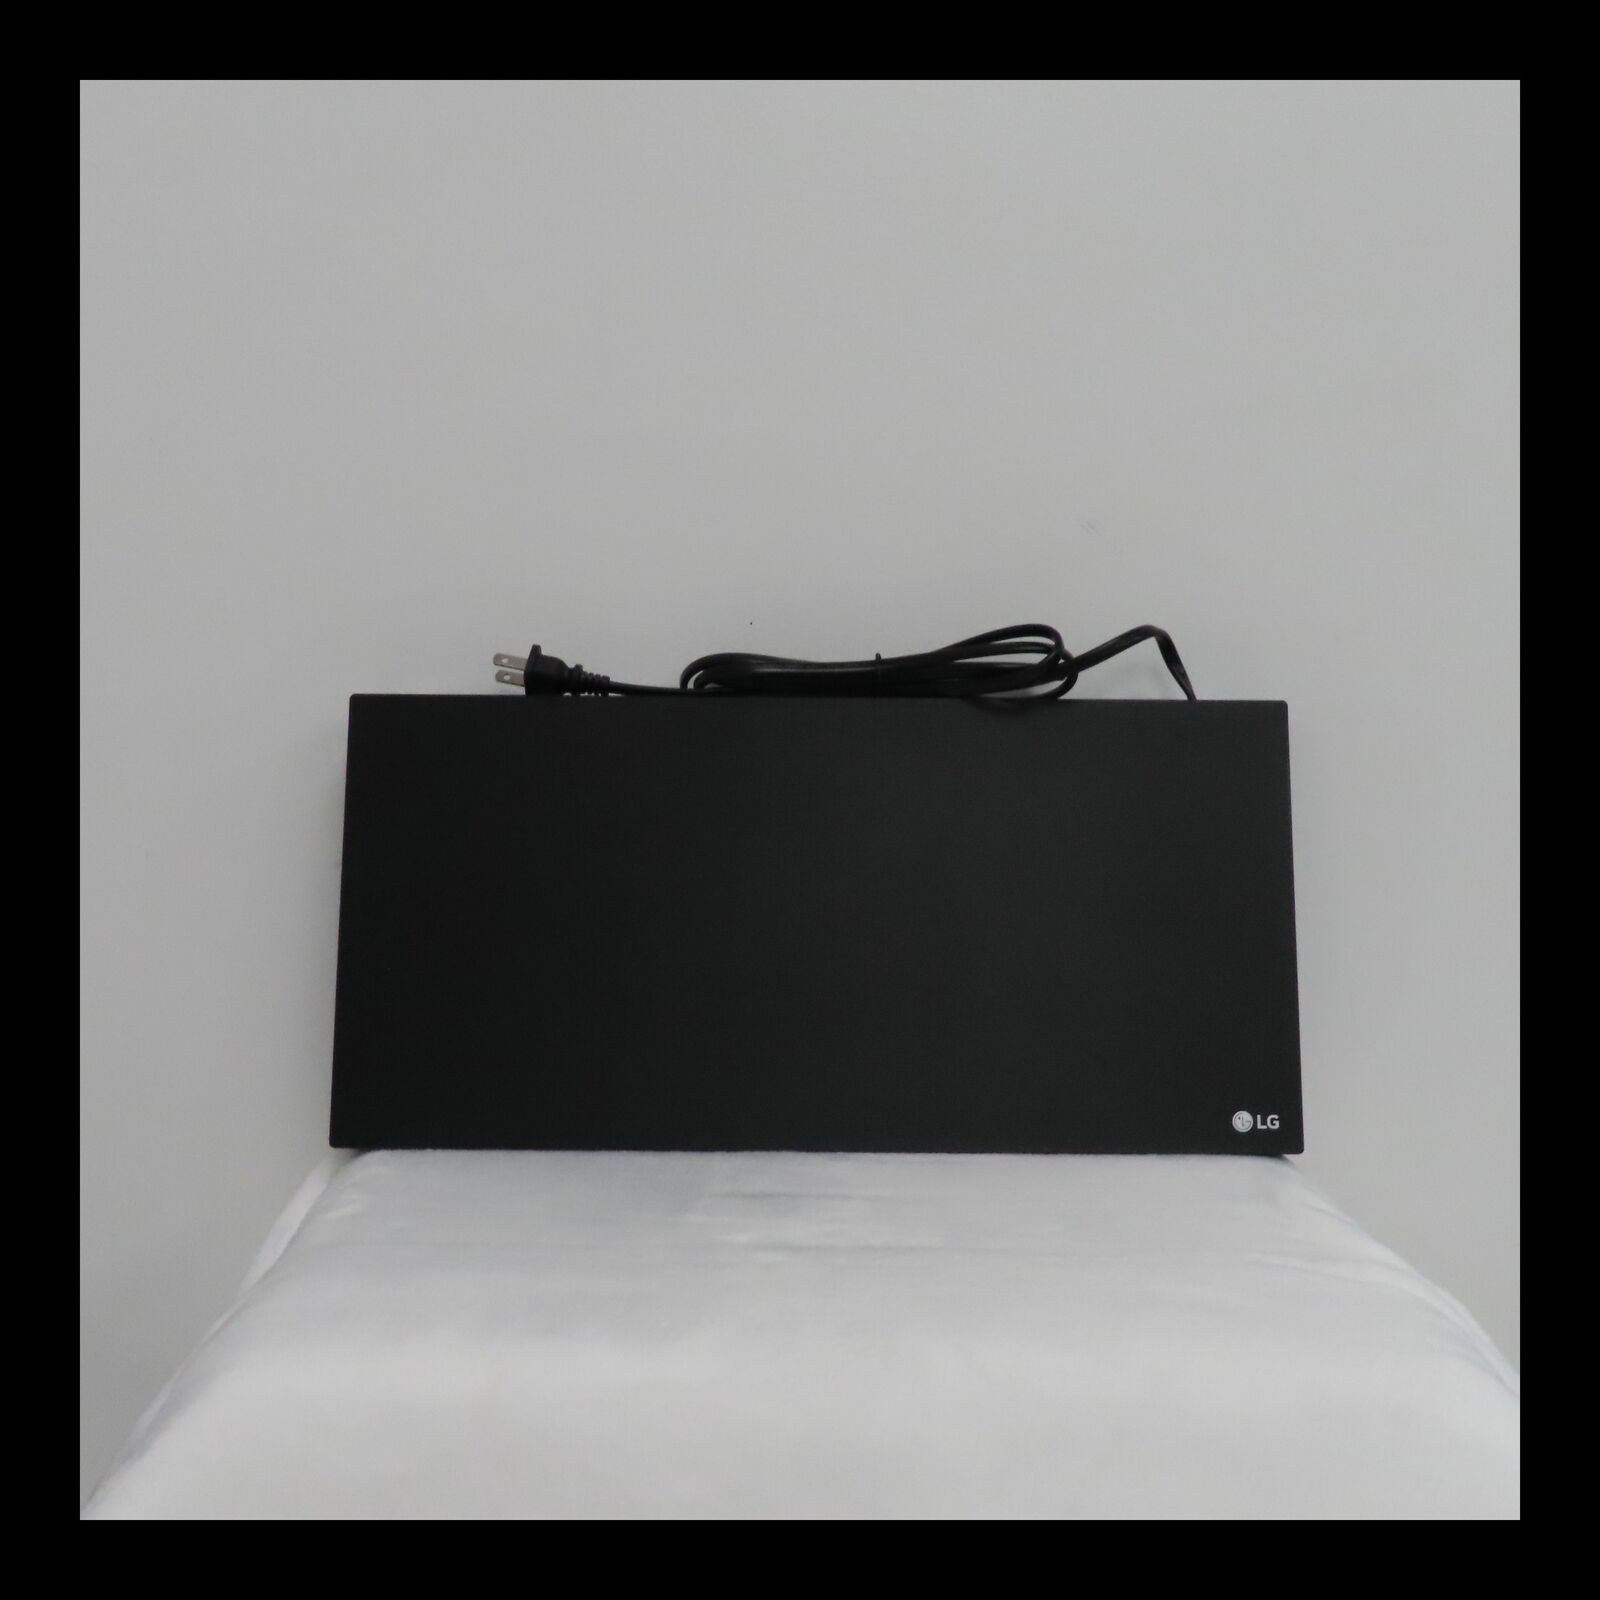 LG - Streaming 4K Ultra HD Hi-Res Audio Wi-Fi Built-In Blu-ray Player - Black audio black player streaming ultra